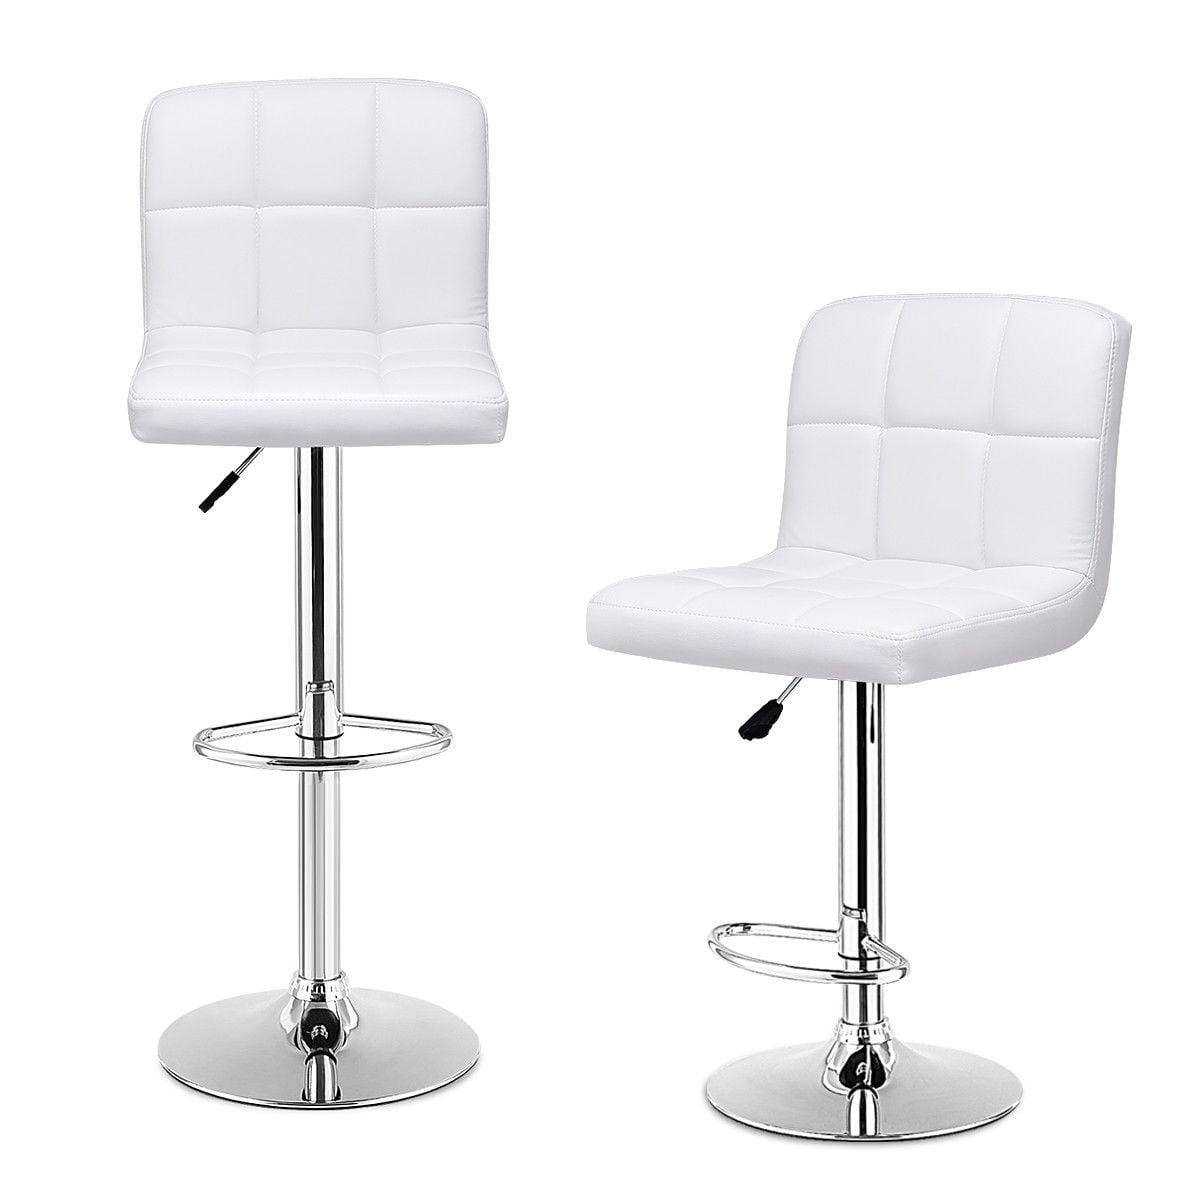 Set Of 2 Bar Stools PU Leather Adjustable Barstool Swivel Pub Chairs White - image 5 de 10